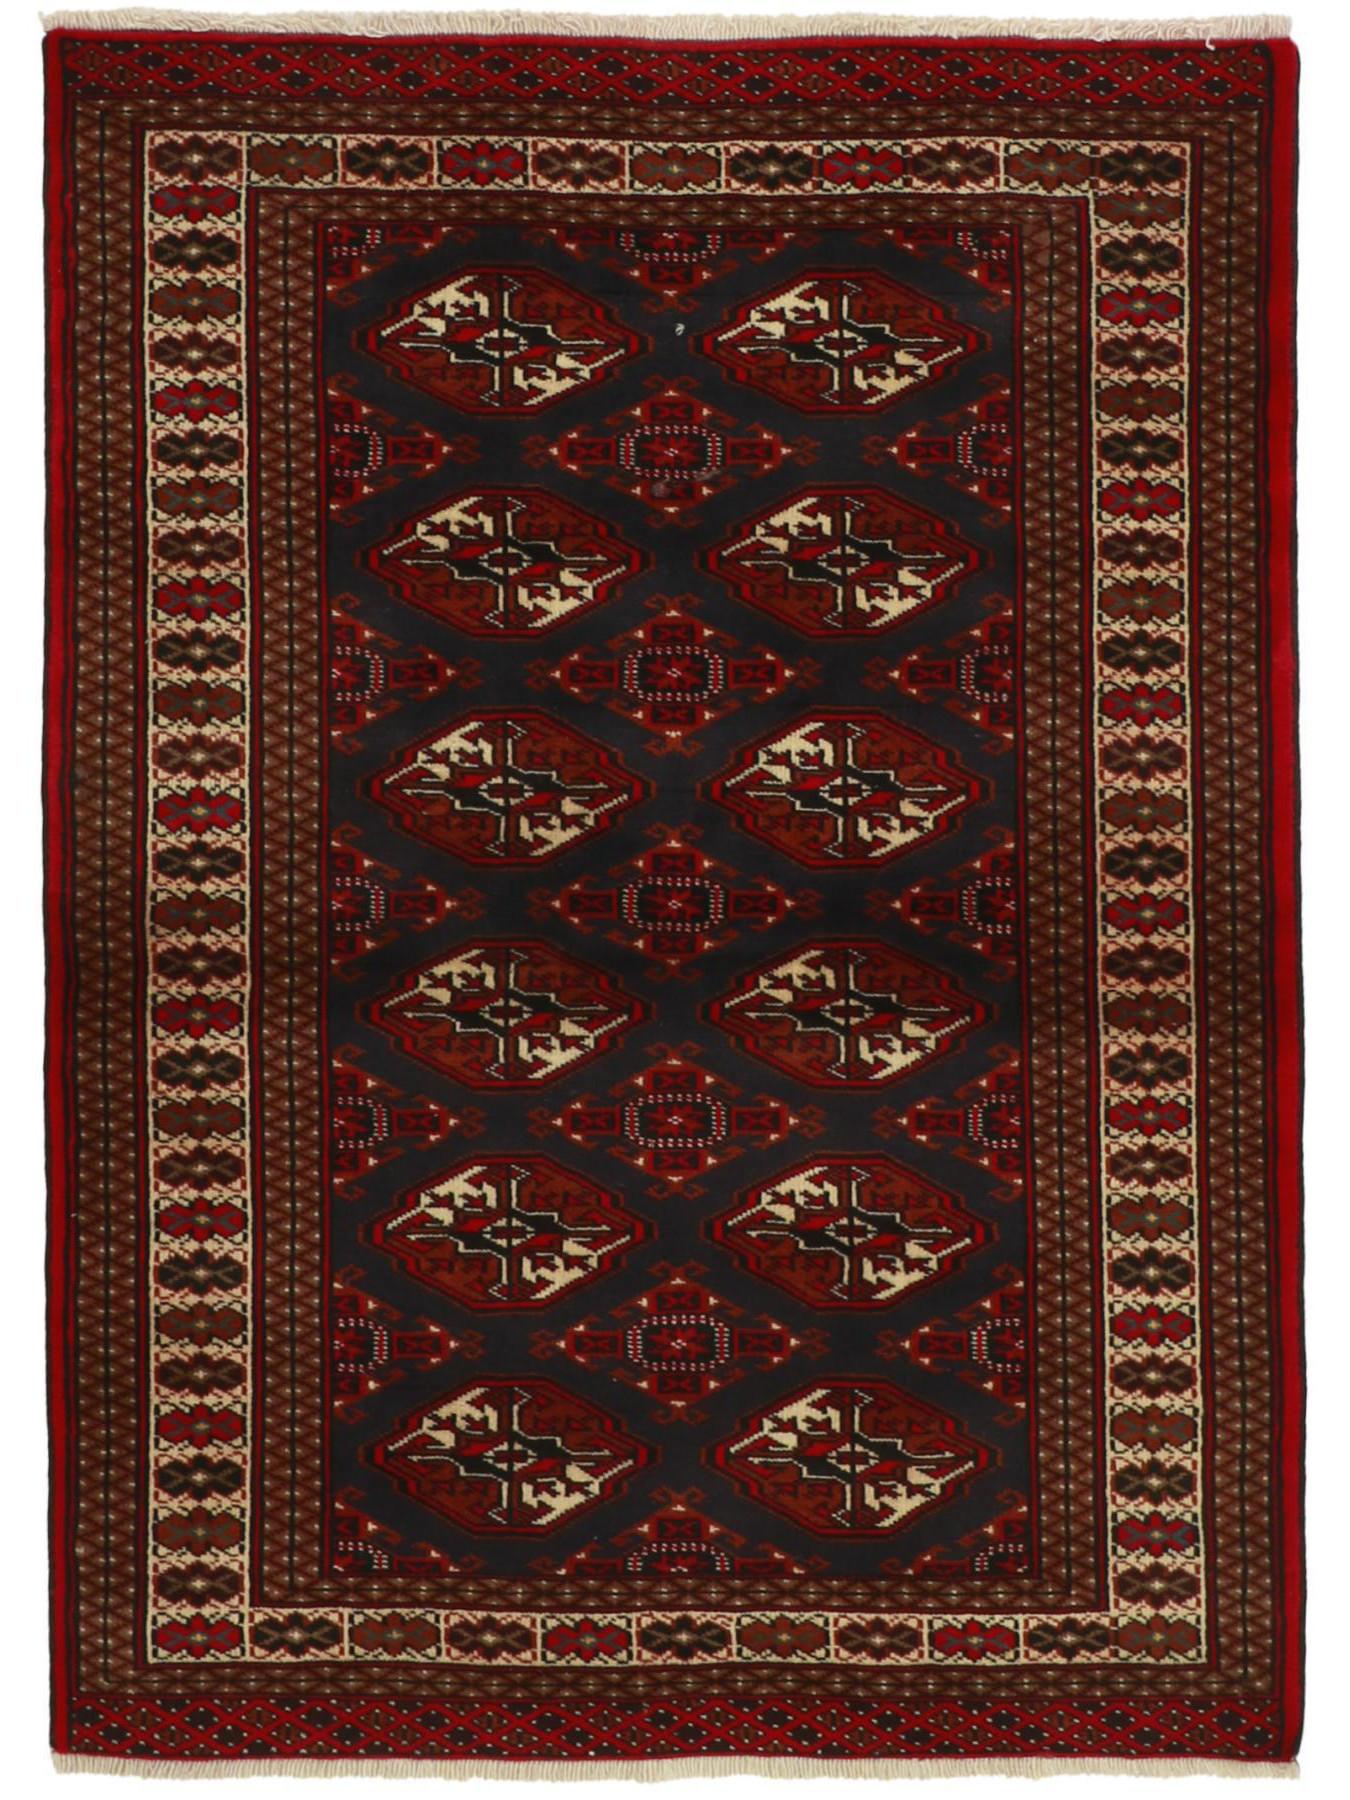 Persian carpets - Turkmens